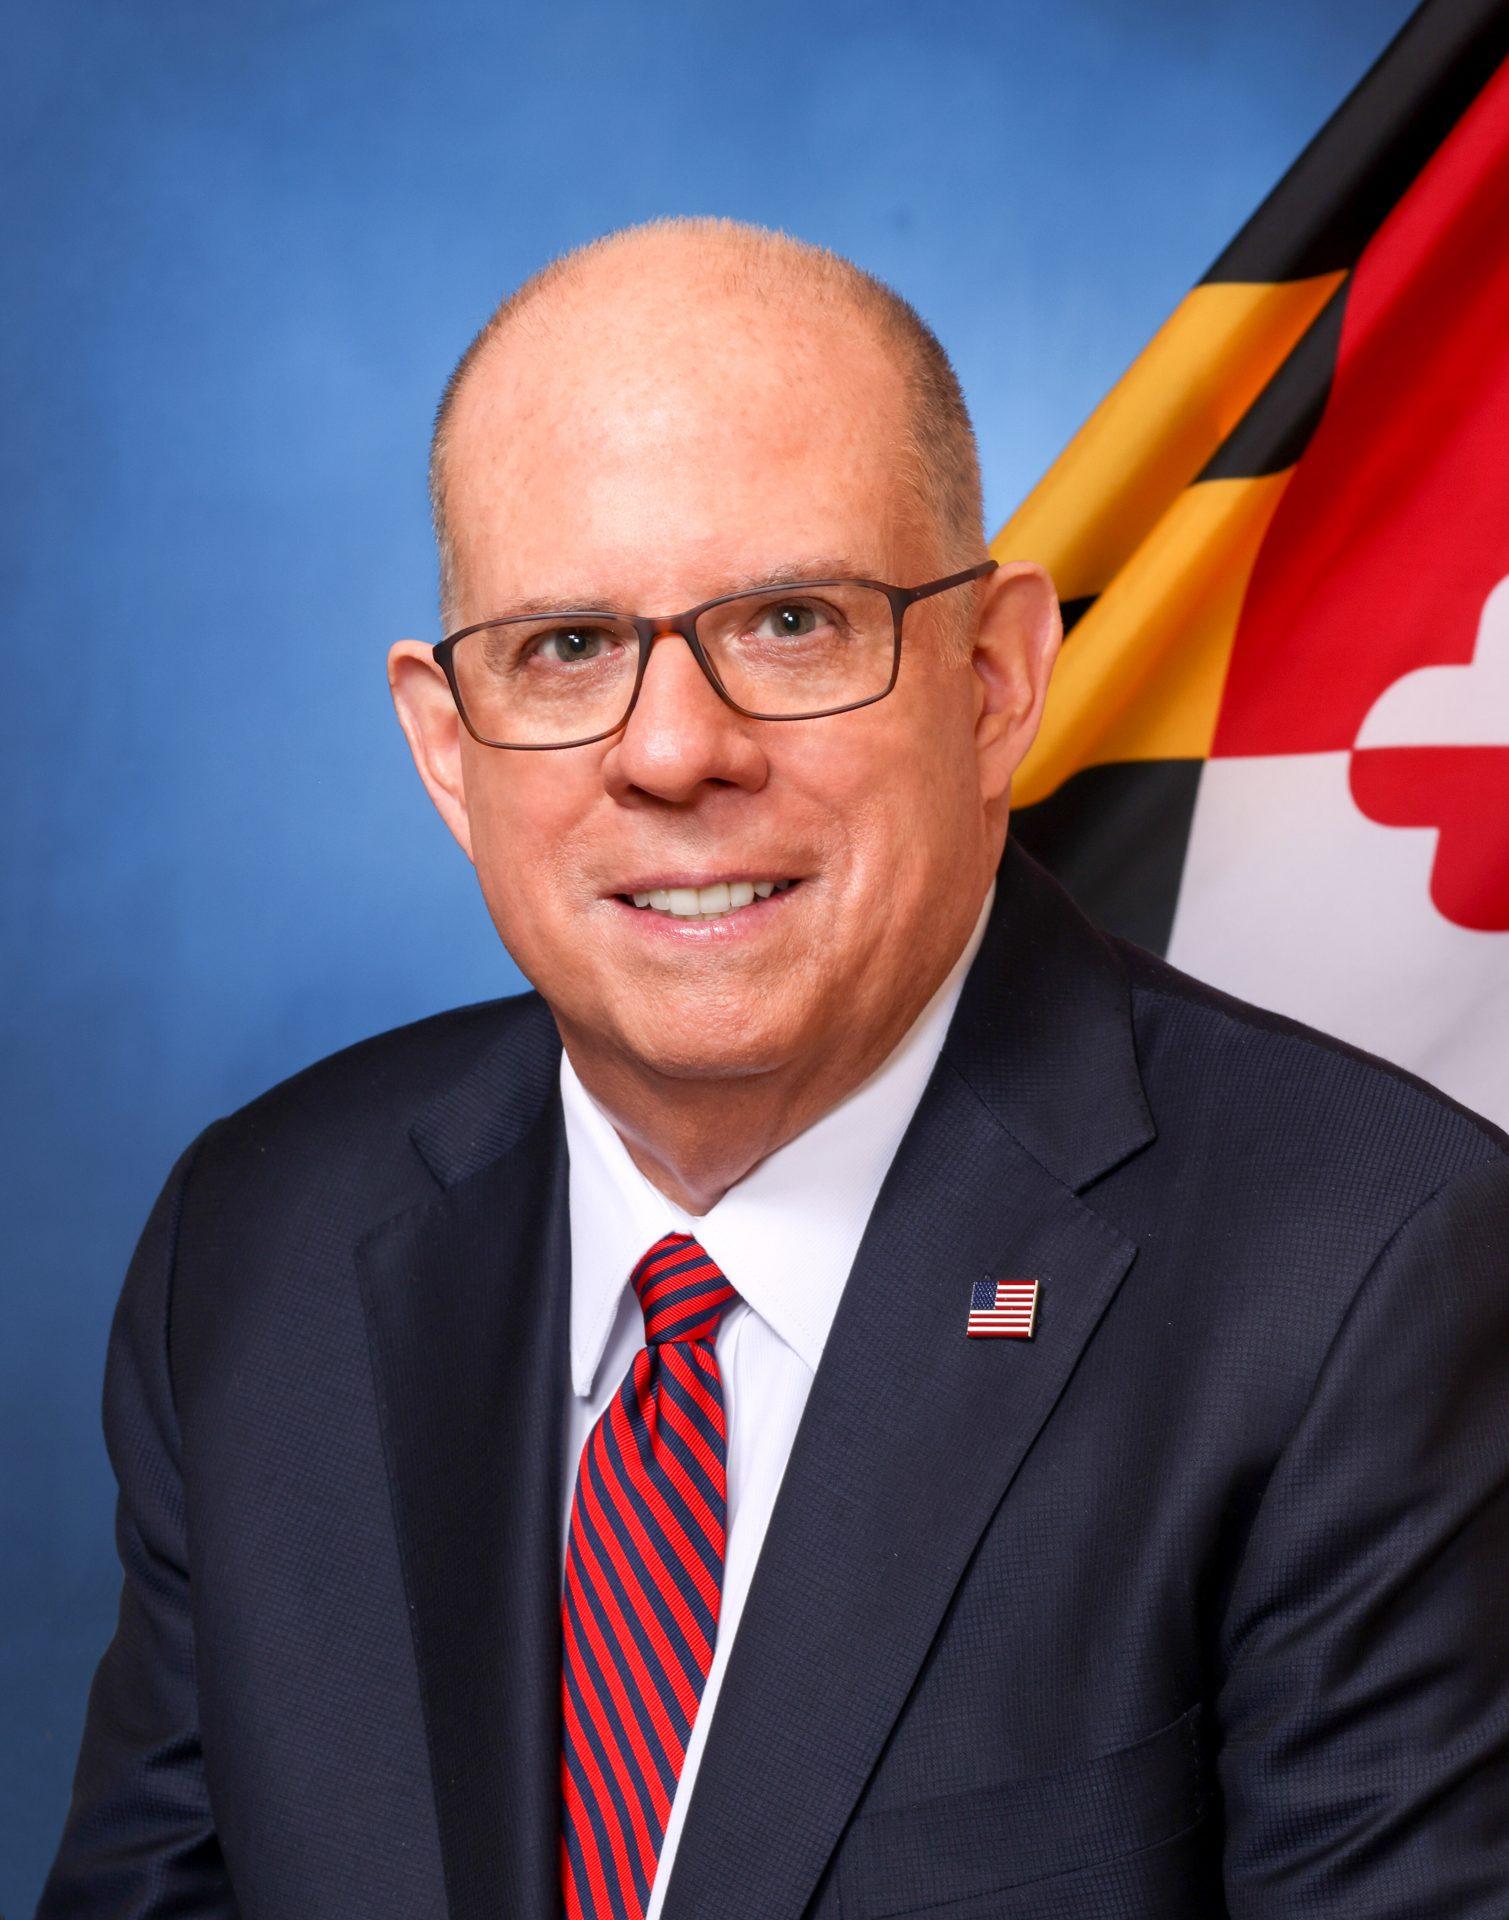 Here's How Governor Hogan Plans to Spend $2.5B Budget Surplus